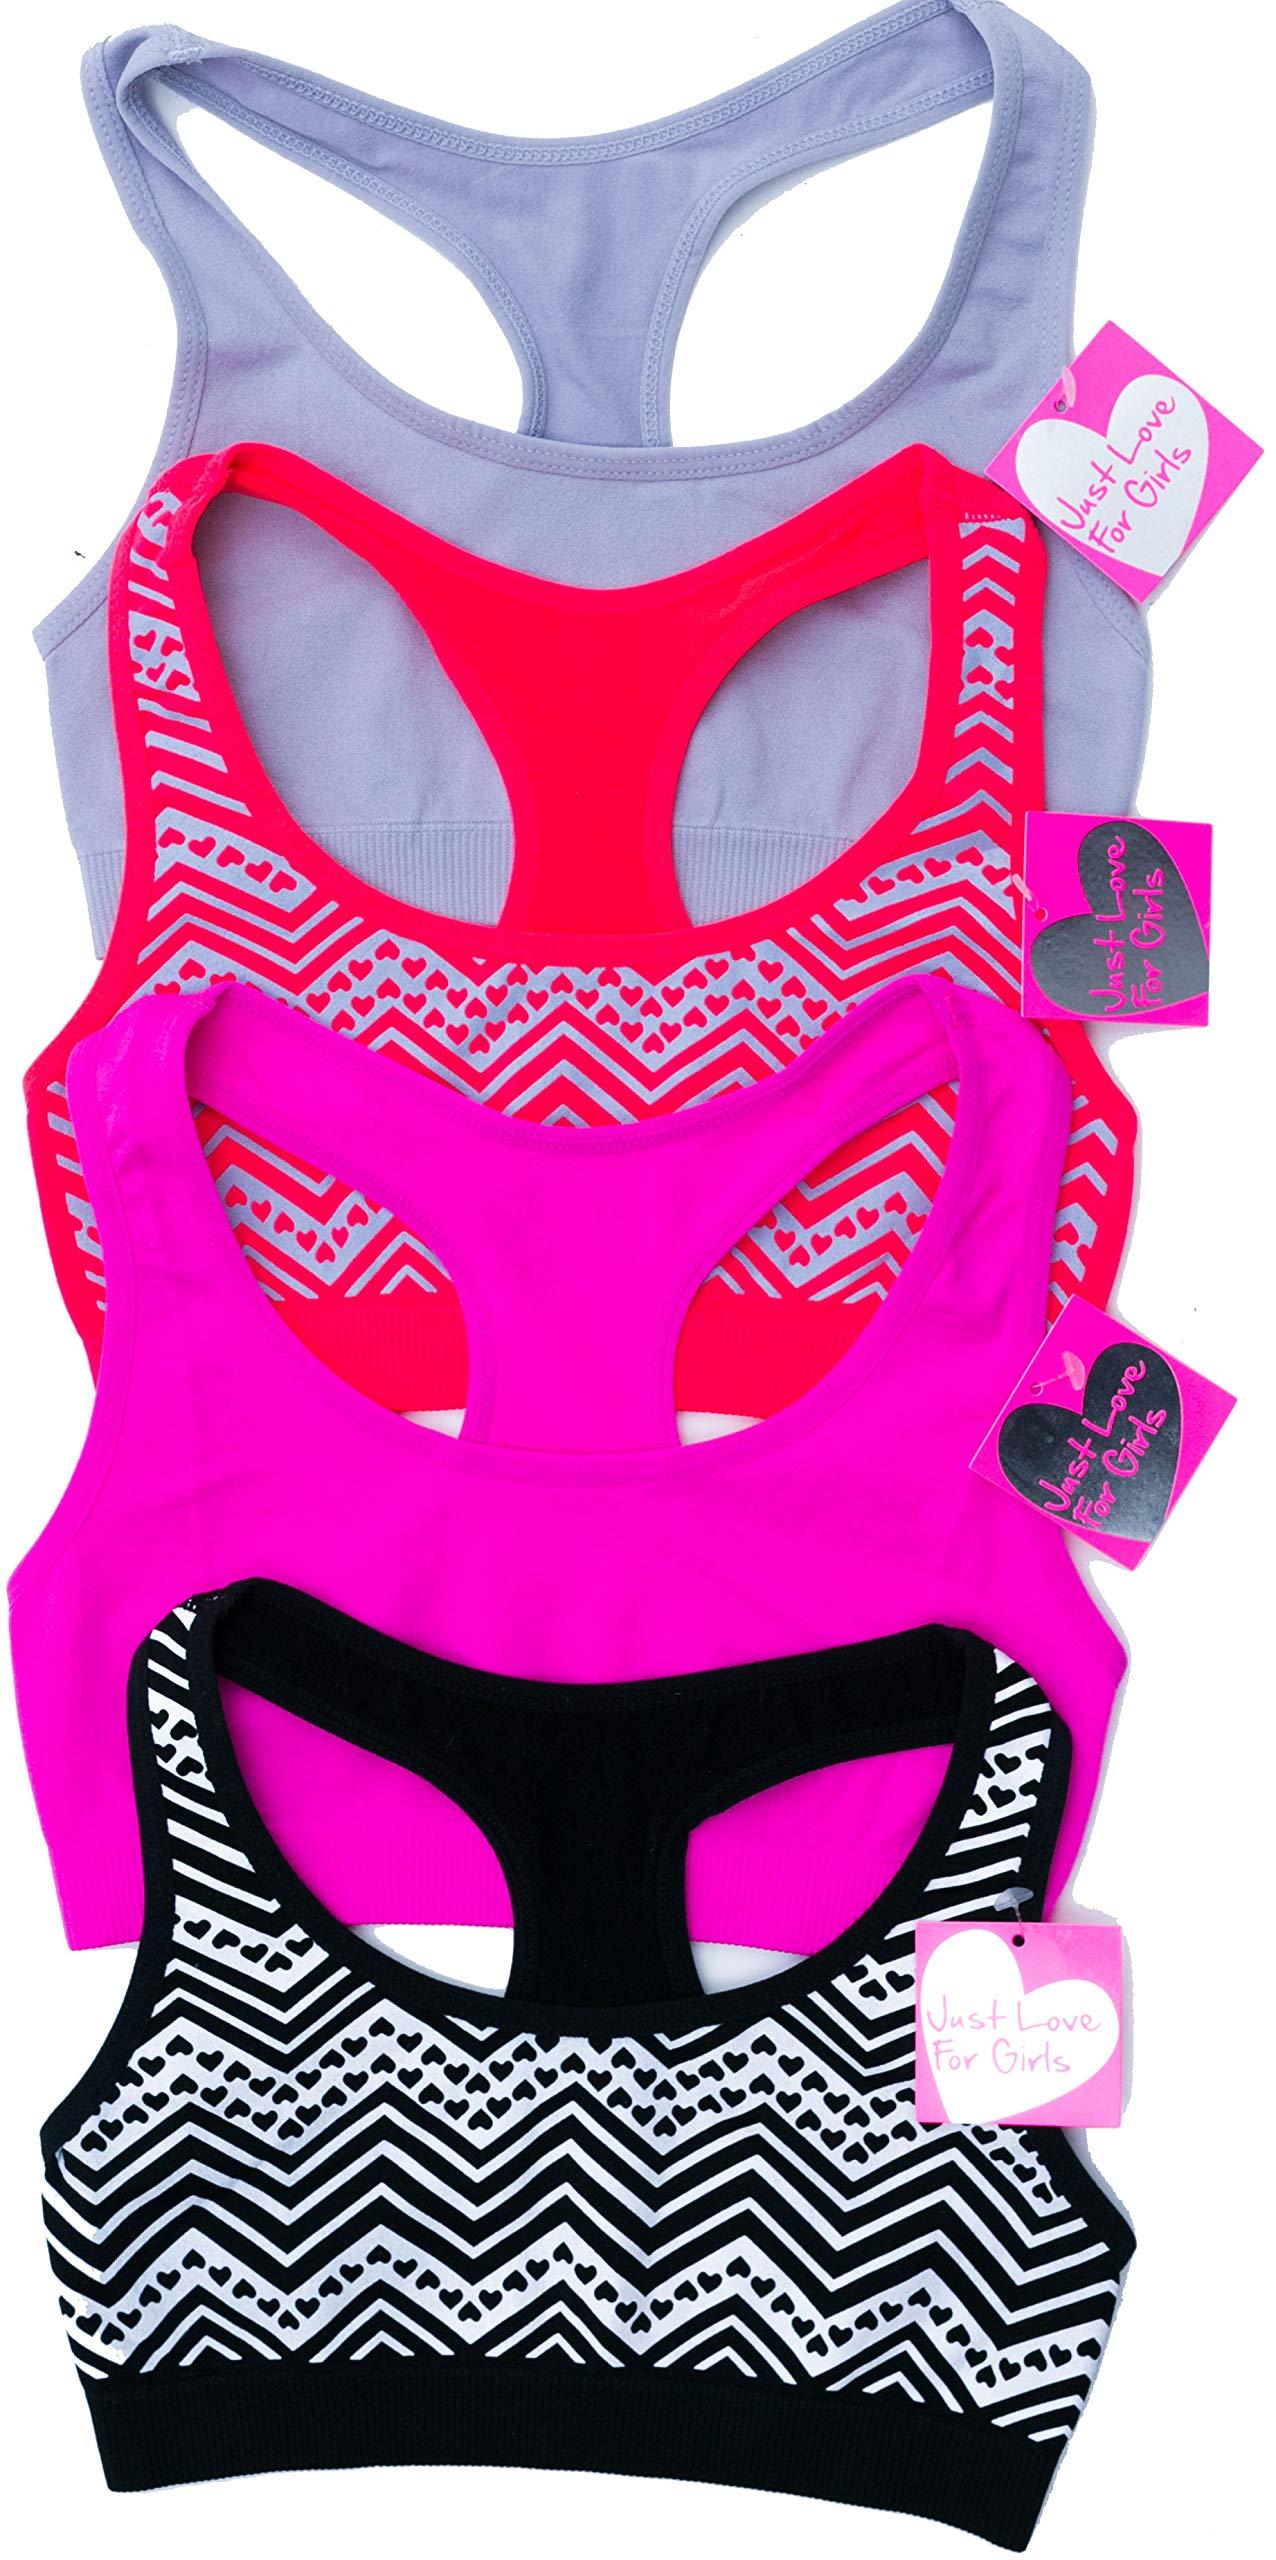 Just Love GB-4P-37002-XL Girls Bras/Seamless Crop Sports Bra for Girls (Pack of 4)